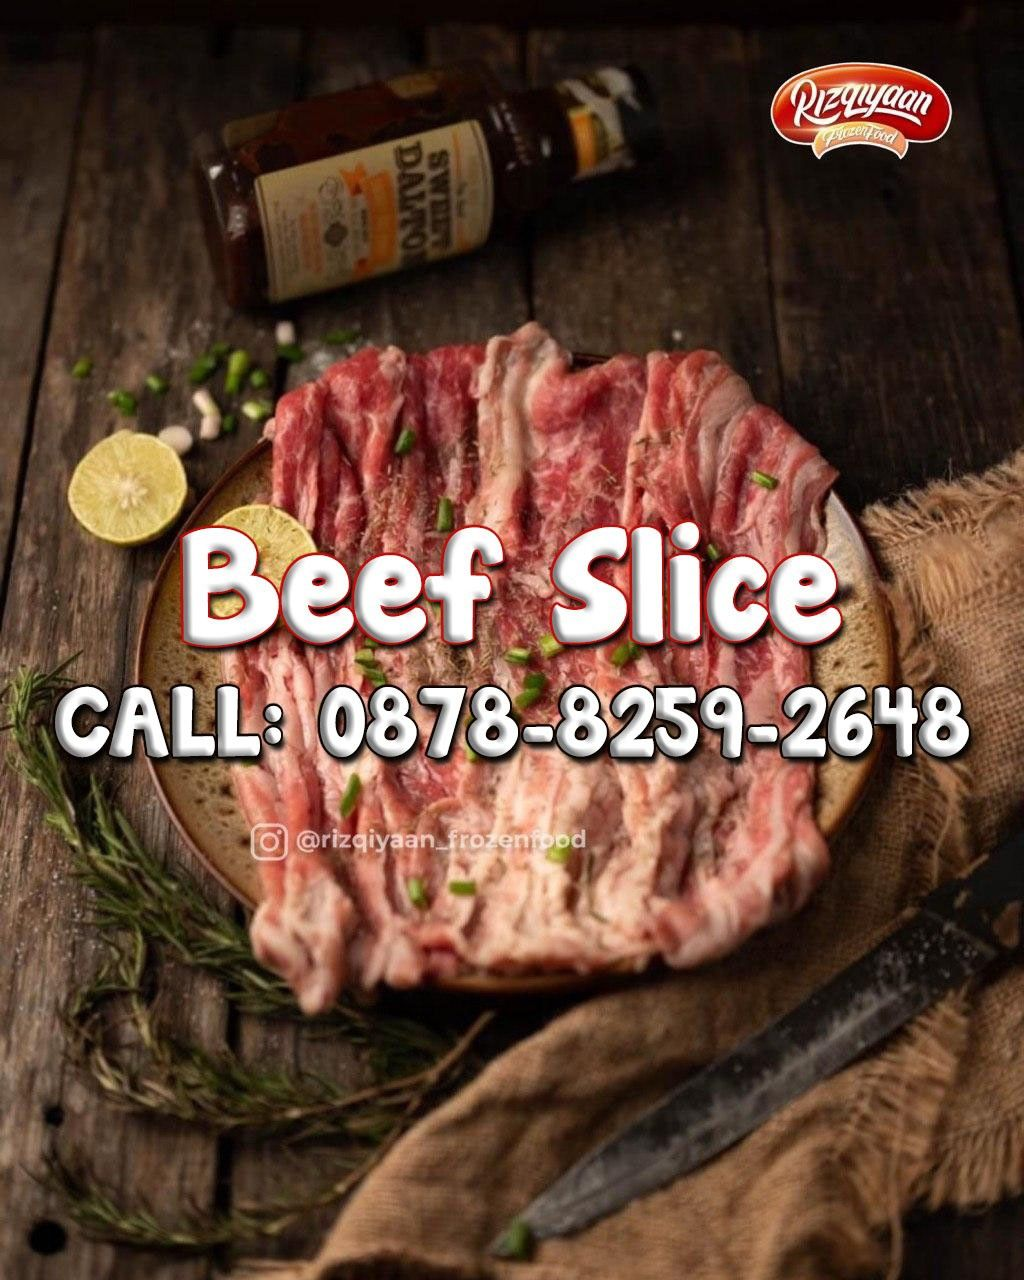 Special Call 0878 8259 2648 Jual Daging Kebab Candi Sidoarjo Jual Daging Steak Wagyu Sidoarjo Jual Daging Saikoro Si Daging Sapi Cincang Daging Sapi Kebab